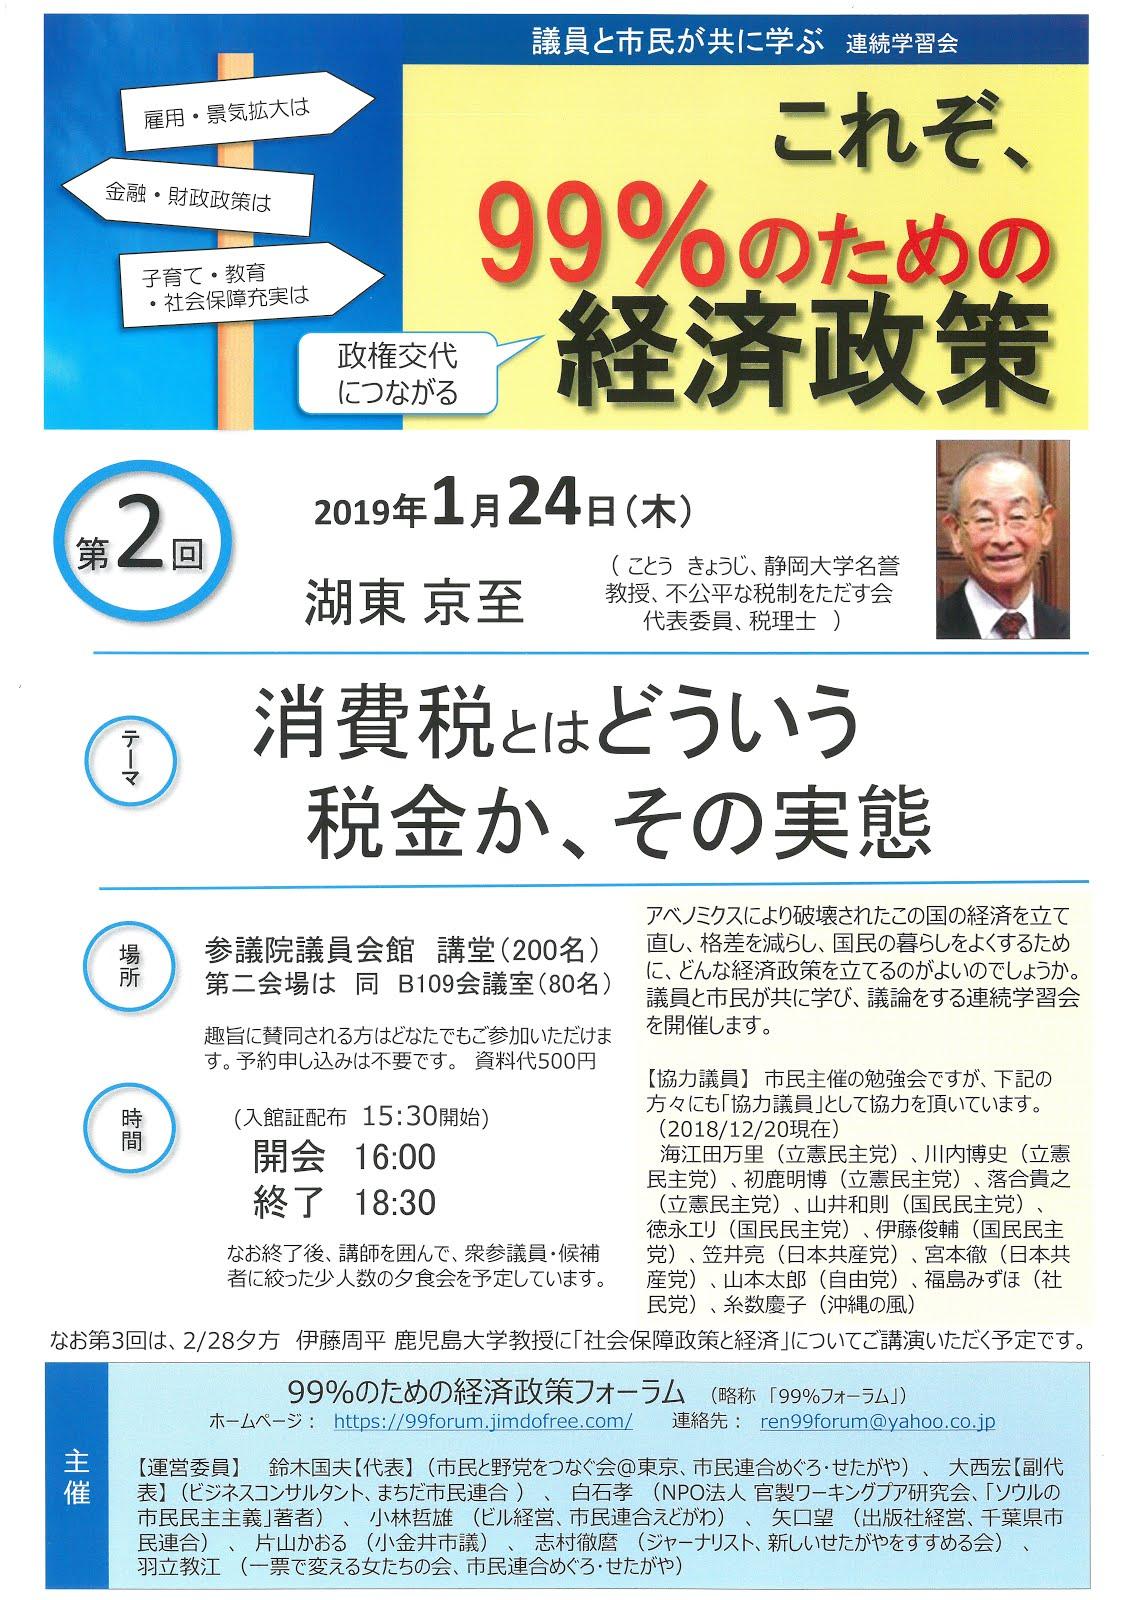 1月24日(木)「99%フォーラム」第2回「消費税」湖東京至静岡大名誉教授16:00参院議員会館 講堂。